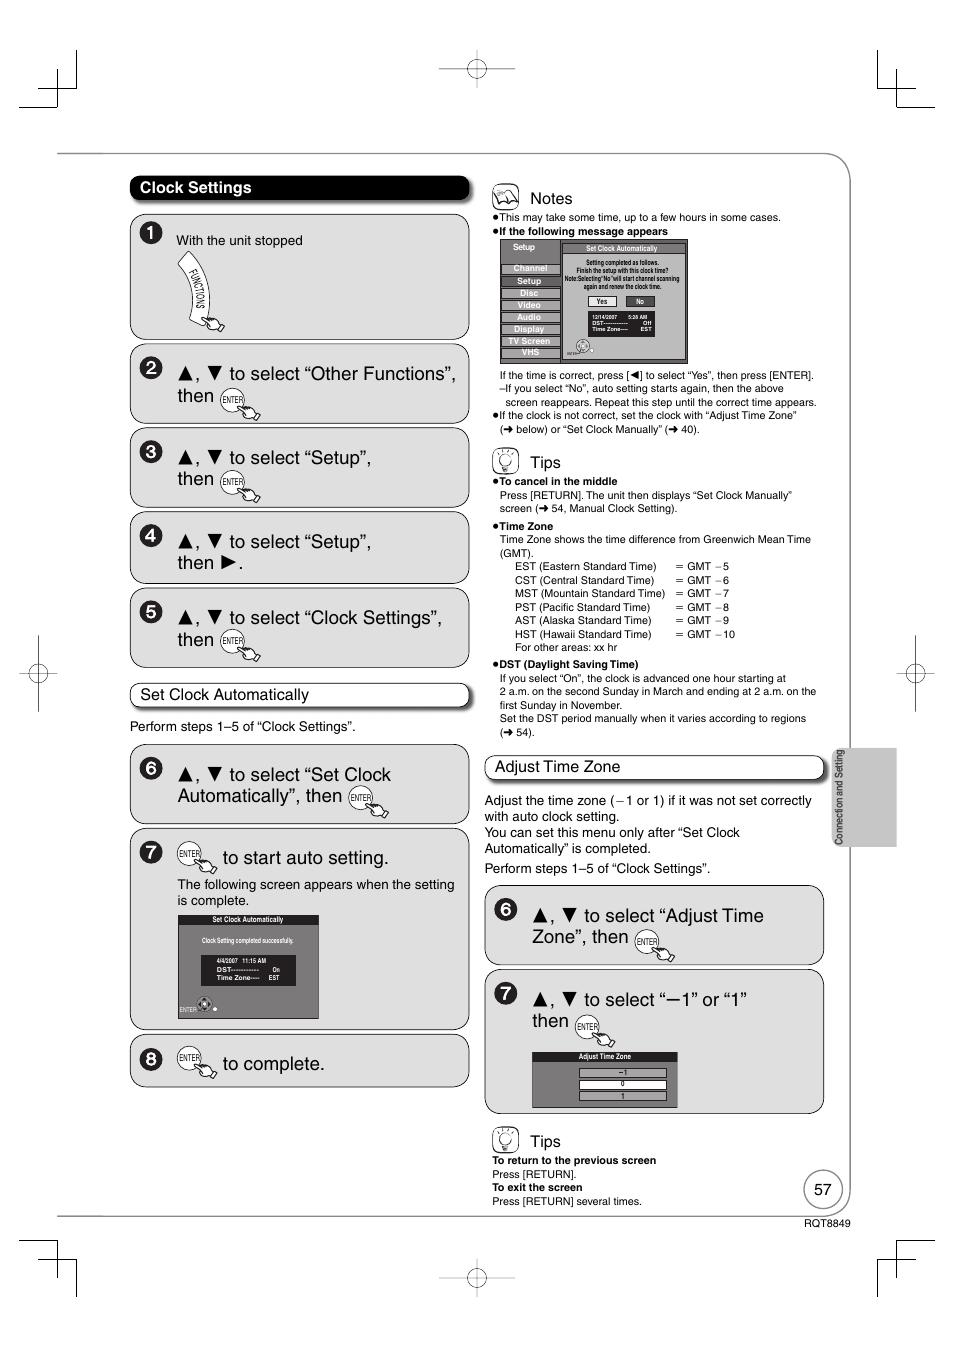 set clock automatically clock settings tips panasonic dmr ez37v rh manualsdir com panasonic dmr ez47v manual pdf Panasonic VHS Recorder with Tuner